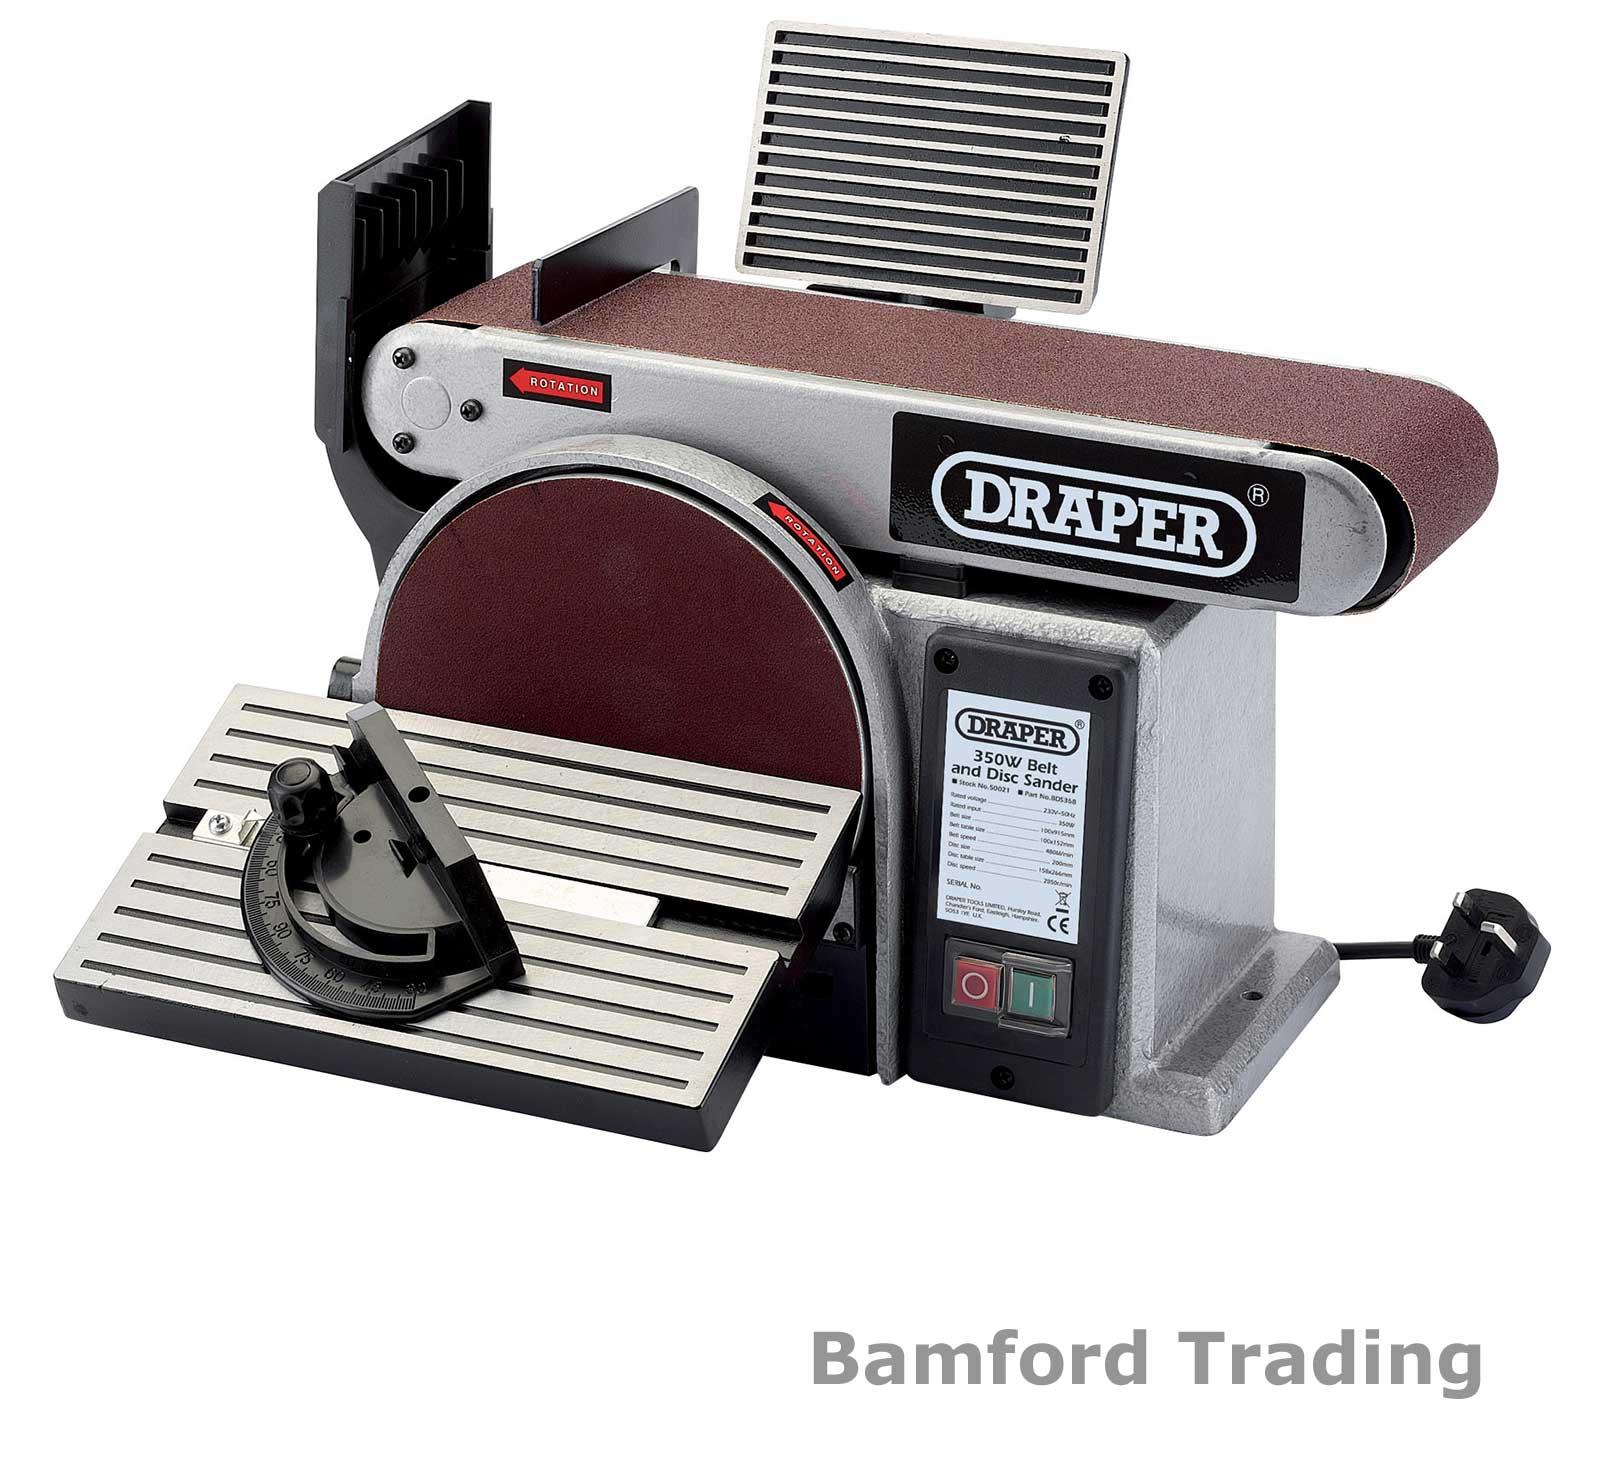 Draper Bench Mounted Belt And Disc Sander Sanding Machine 350w 230v 50021 Bds368 Ebay